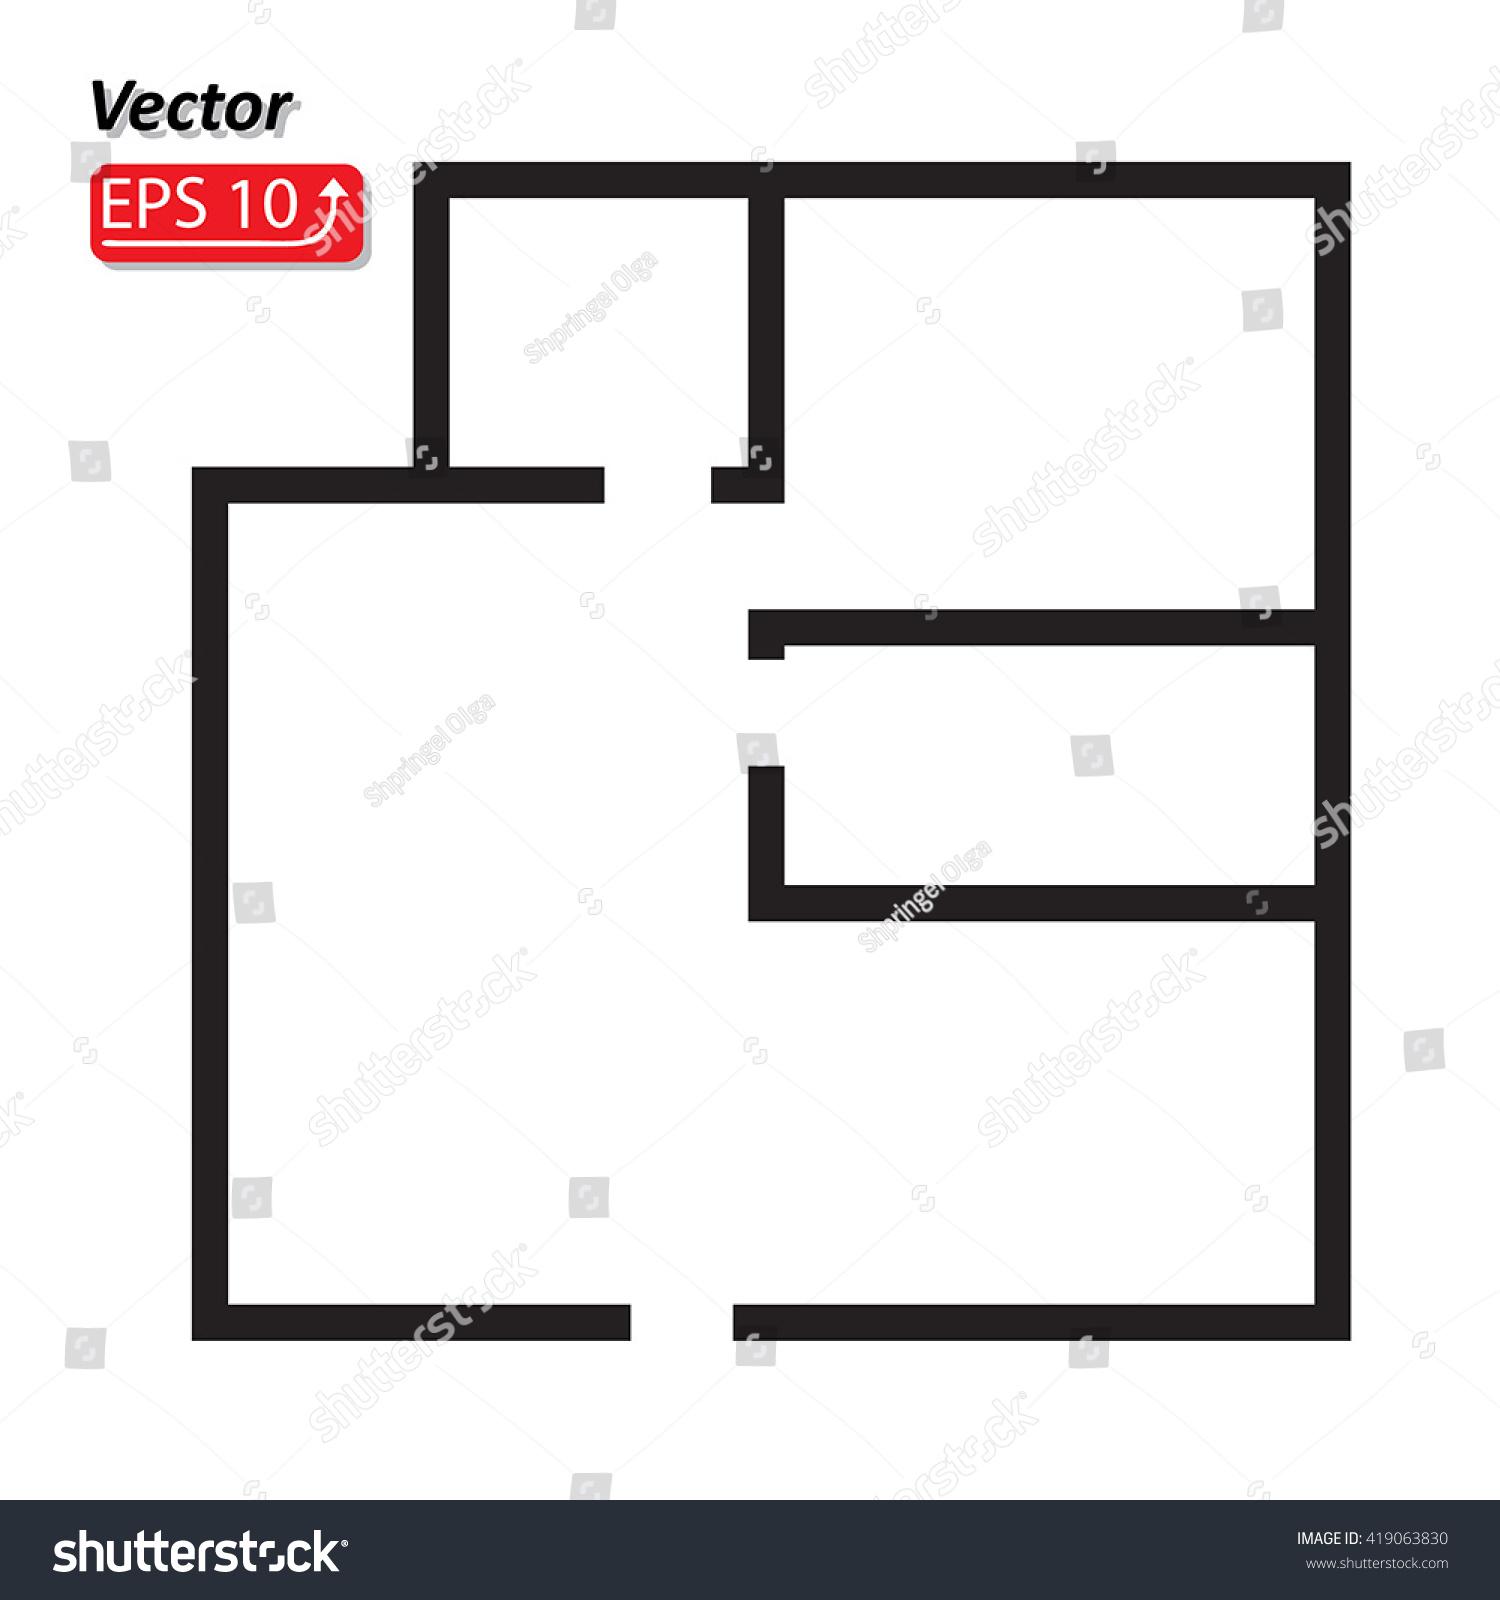 Black white house apartment plan house stock vector 419063830 black and white house apartment plan house home building architecture blueprint icon vector illustration malvernweather Images